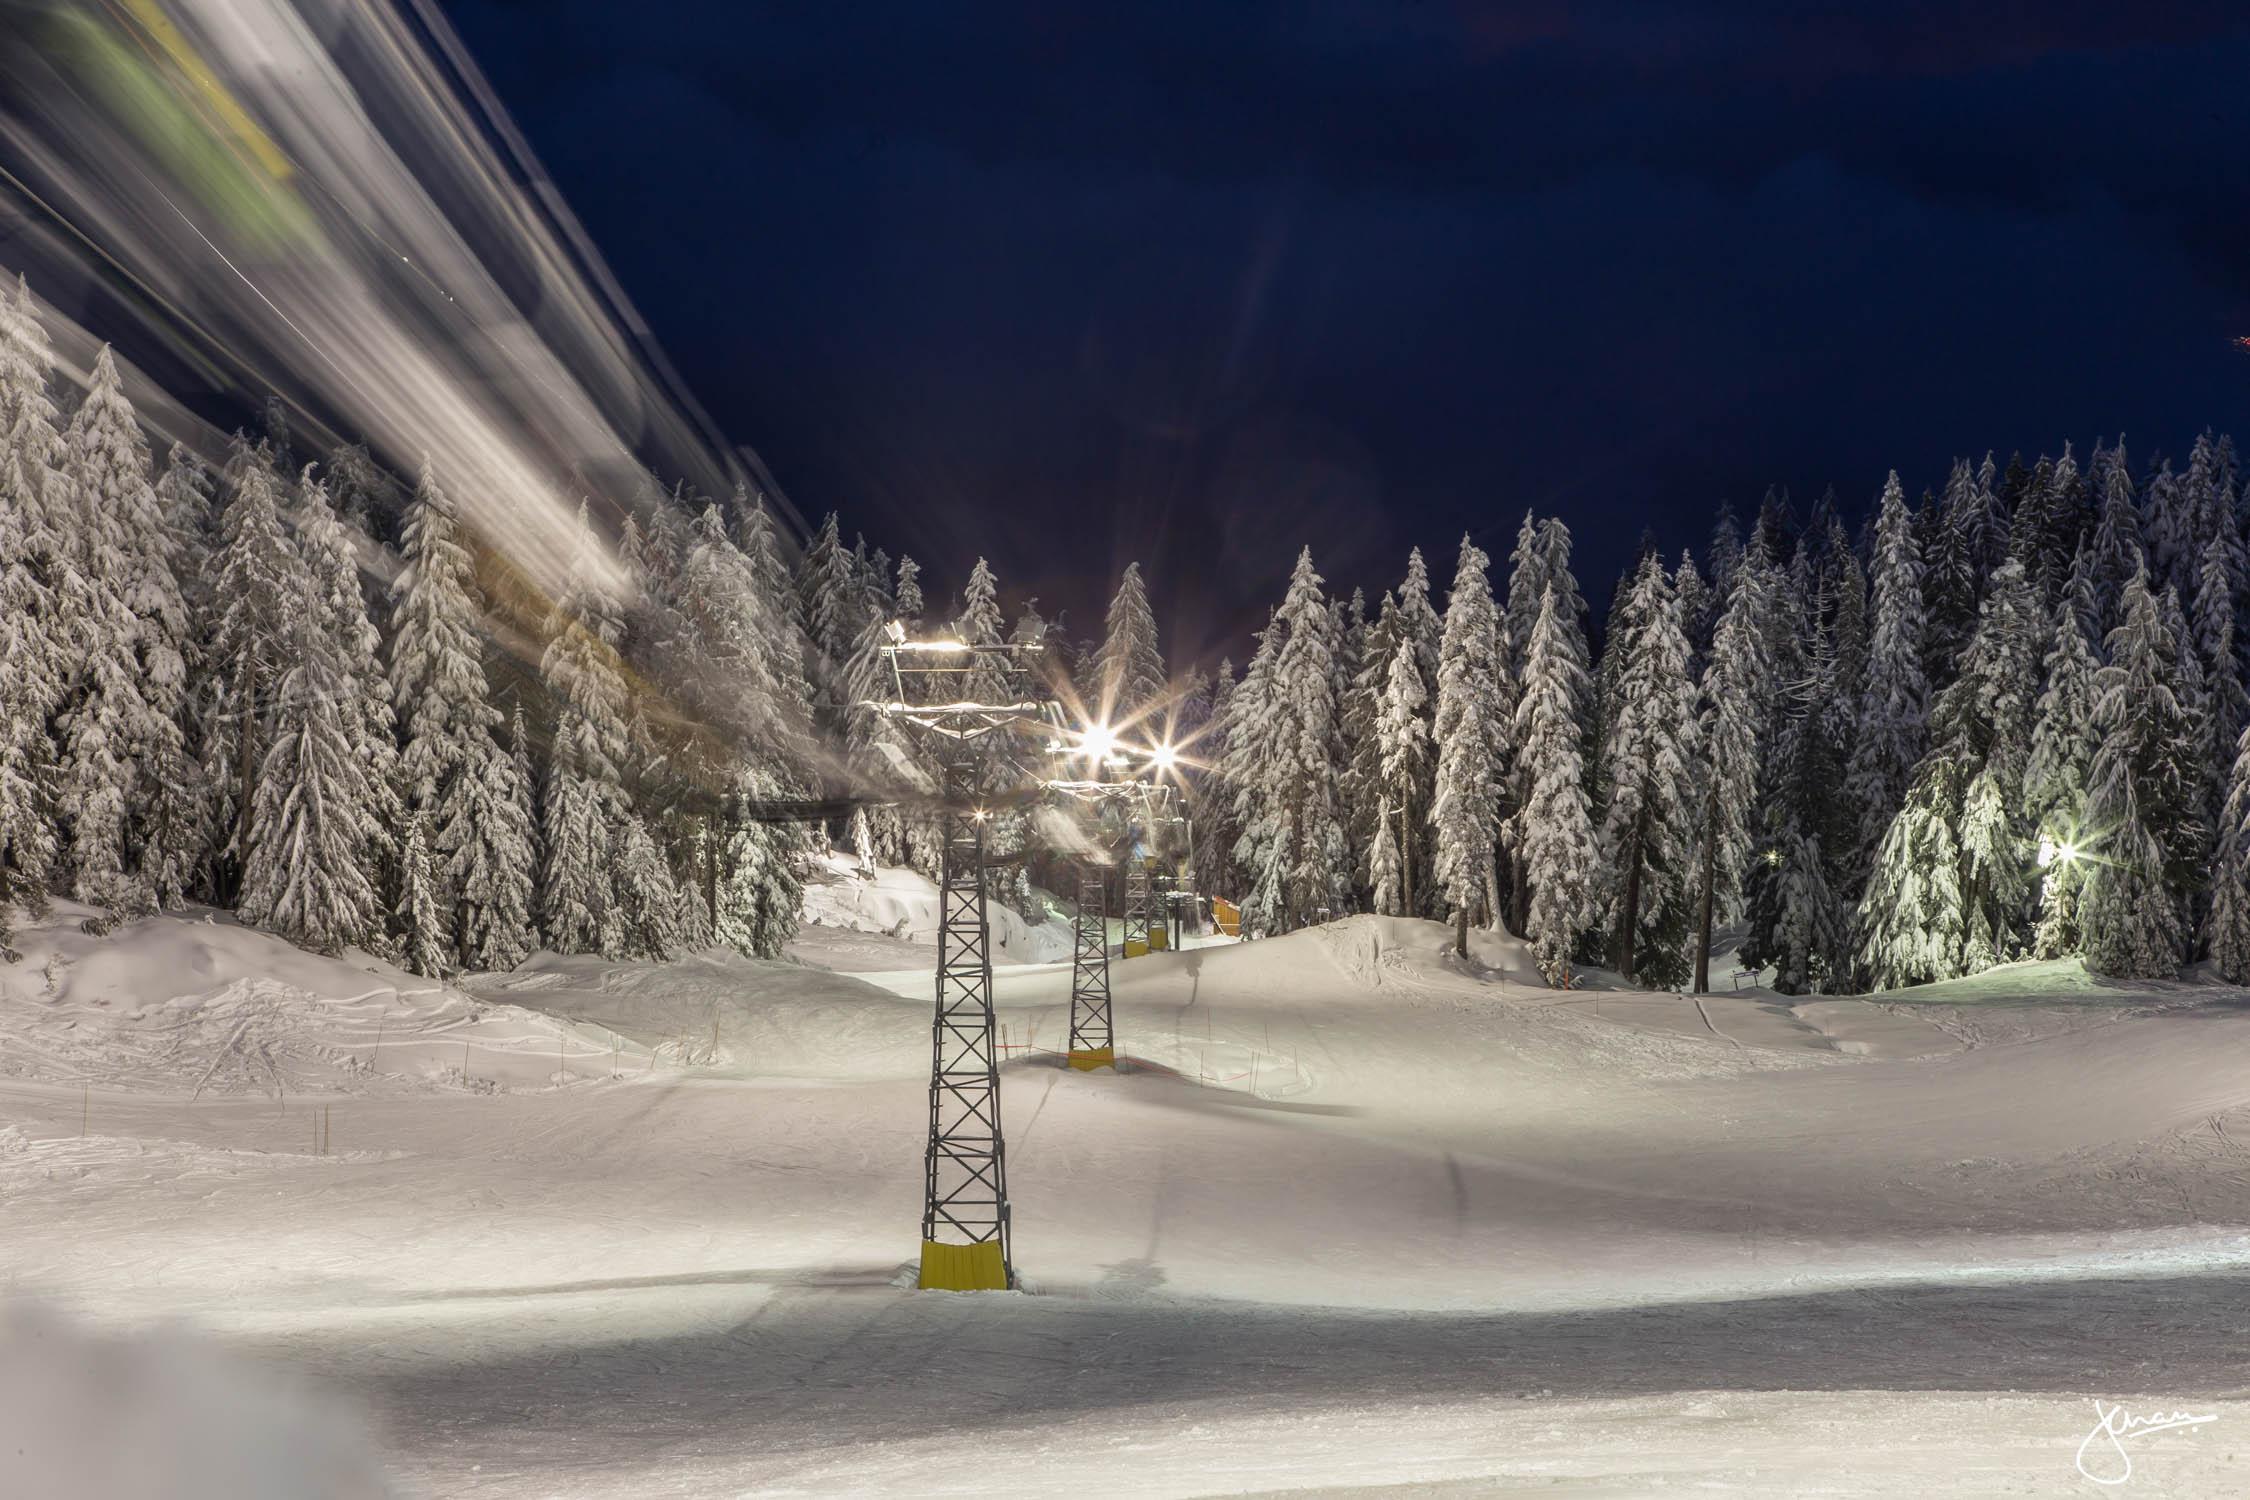 Nighttime on Mount Seymour